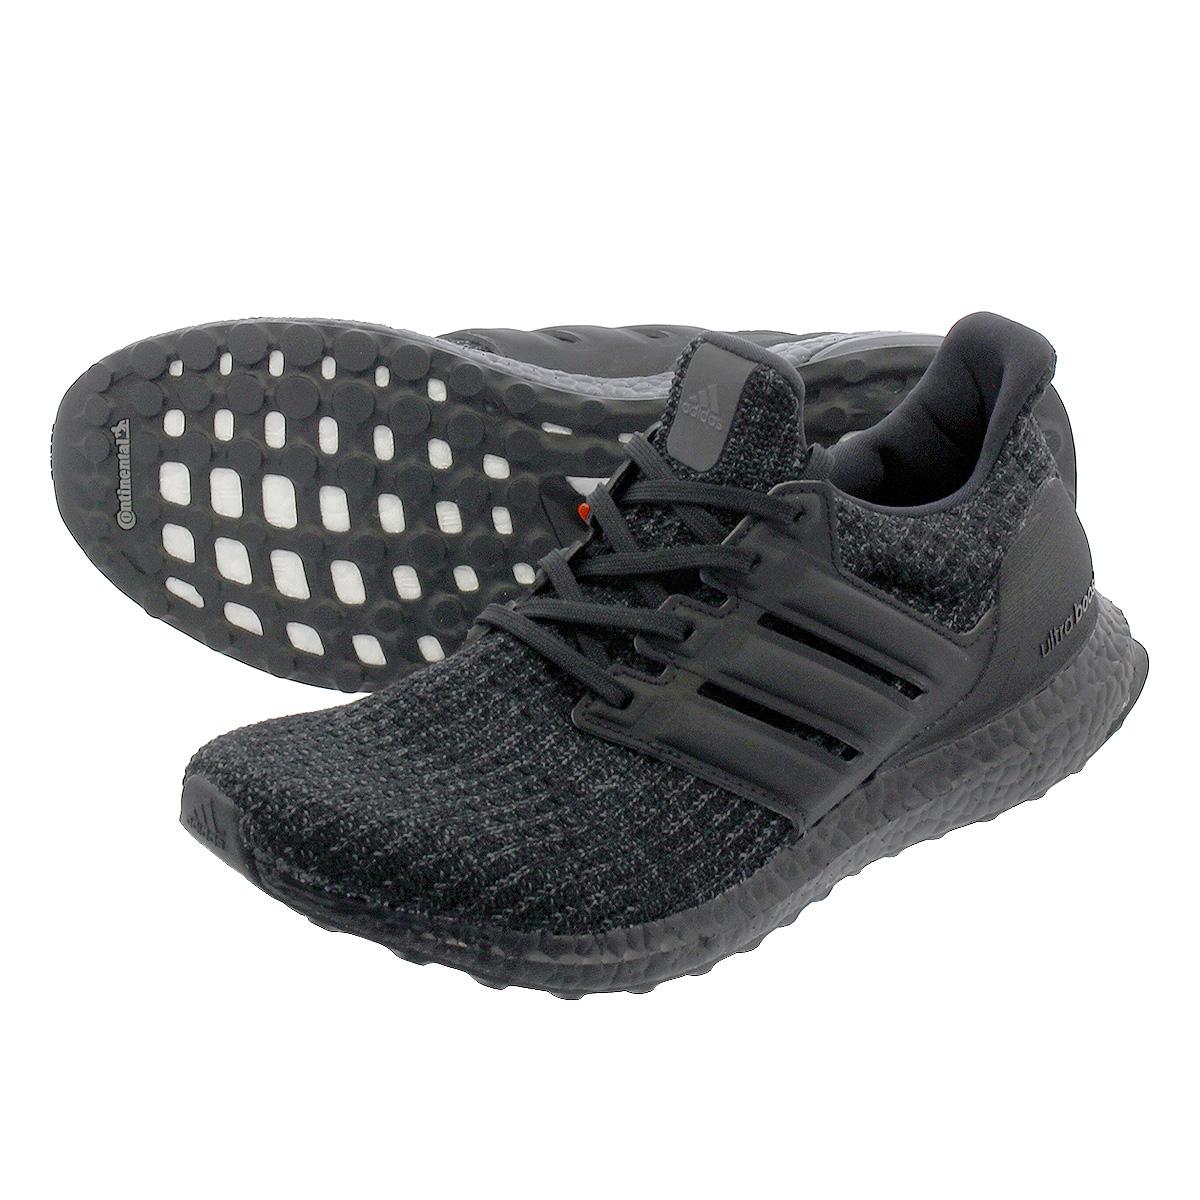 adidas ULTRA BOOST アディダス ウルトラ ブースト CORE BLACK/CORE BLACK/RED f36641